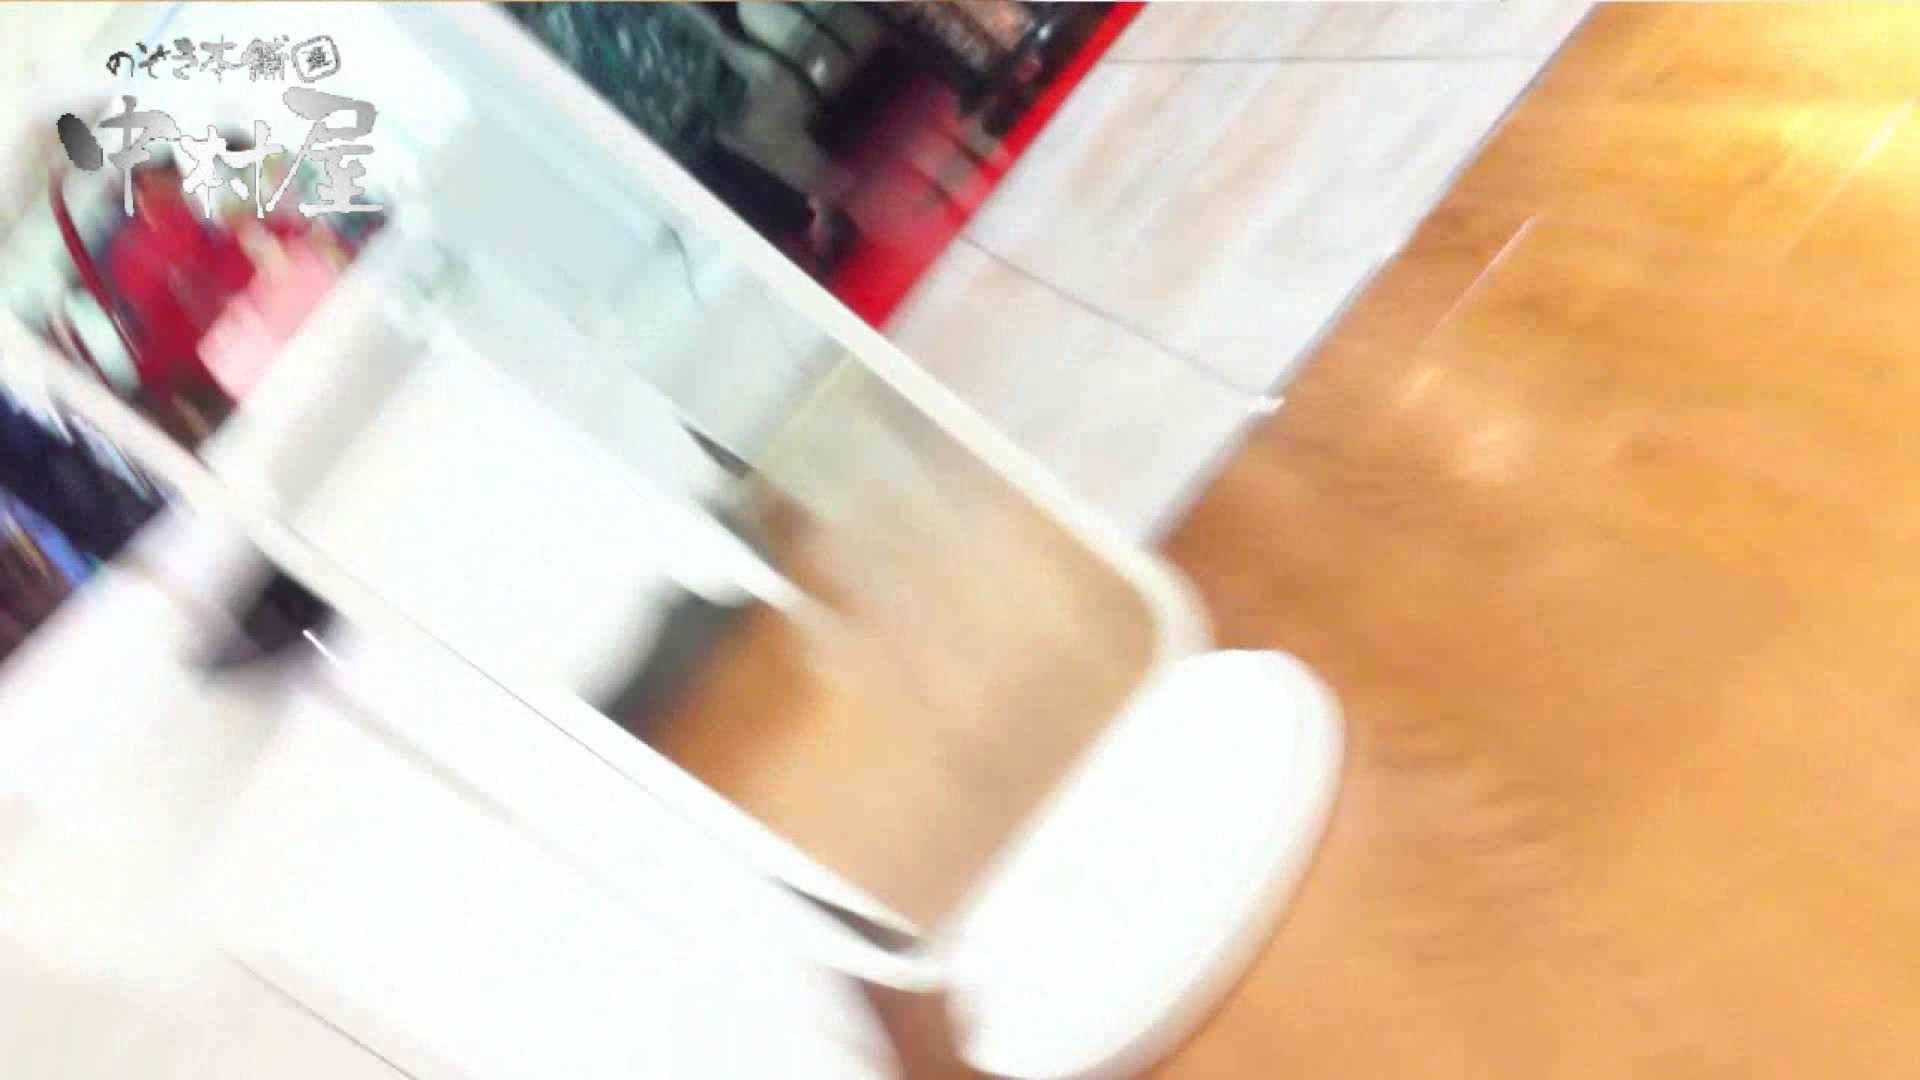 vol.48可愛いカリスマ店員胸チラ&パンチラ アニメ声の店員さん 胸チラ  96Pix 71